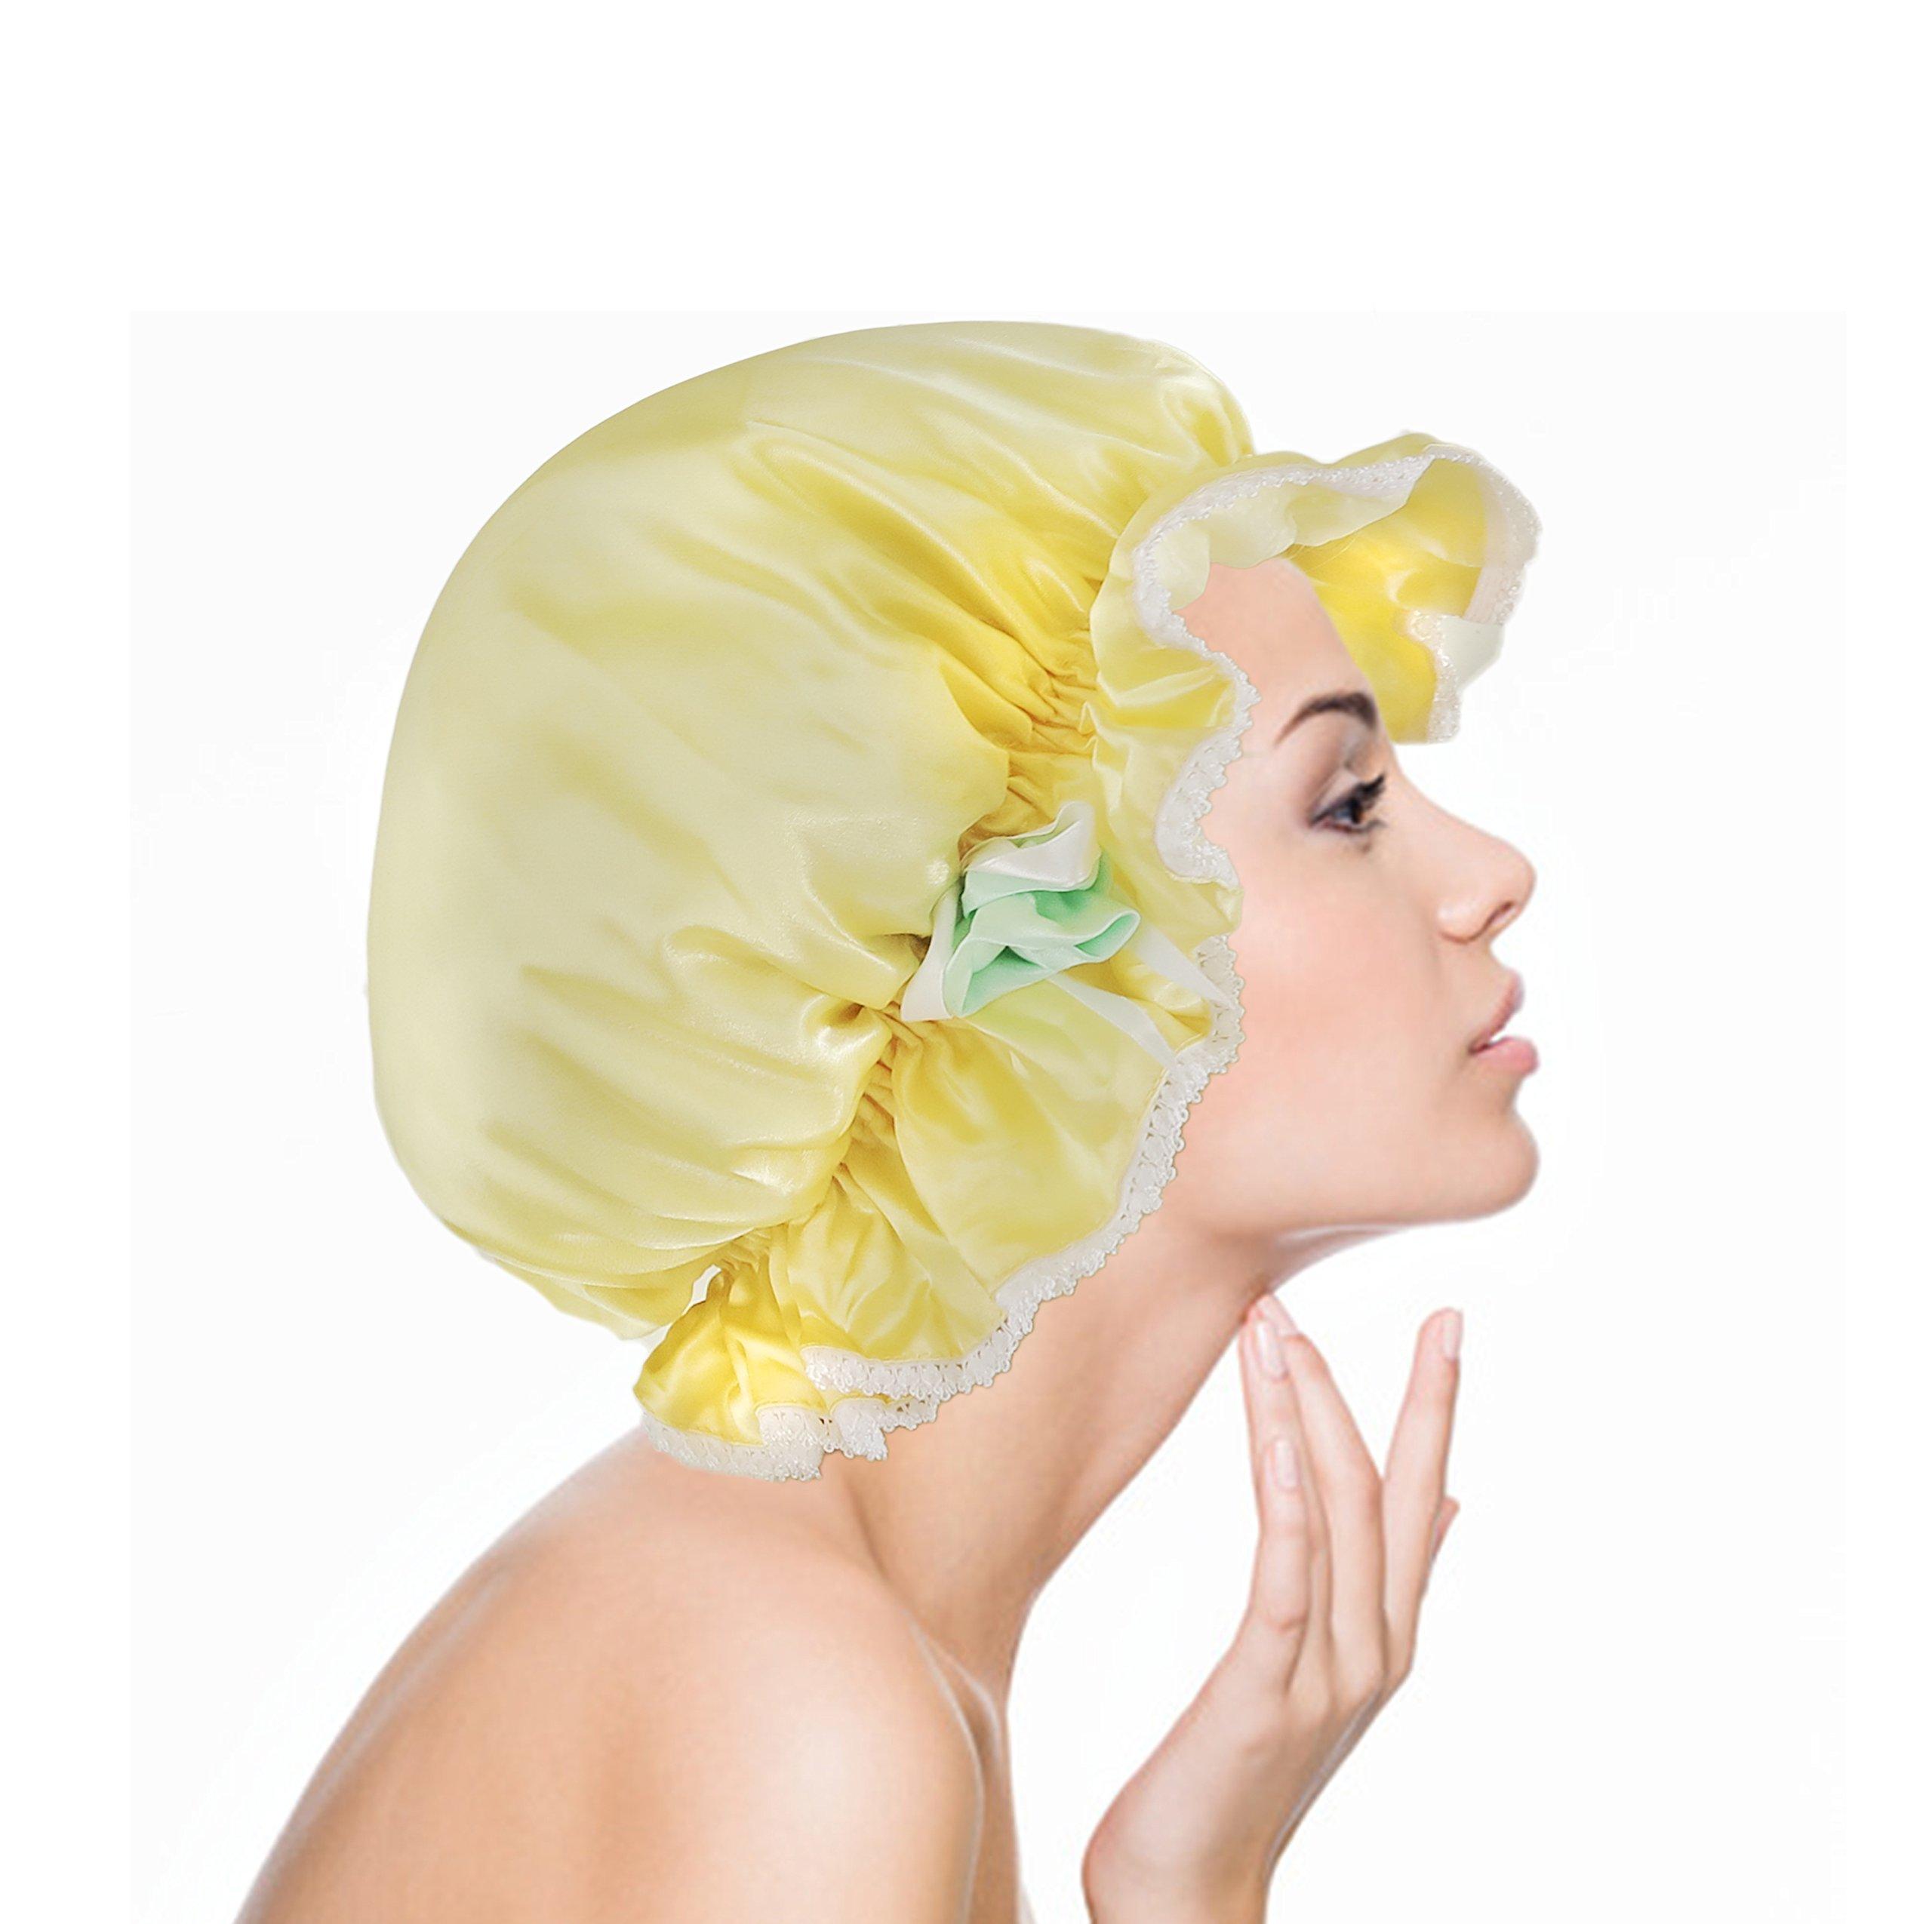 Luxurious Silk Shower Cap waterproof Cap HandCrafted By Vangobeauty Bright Yellow